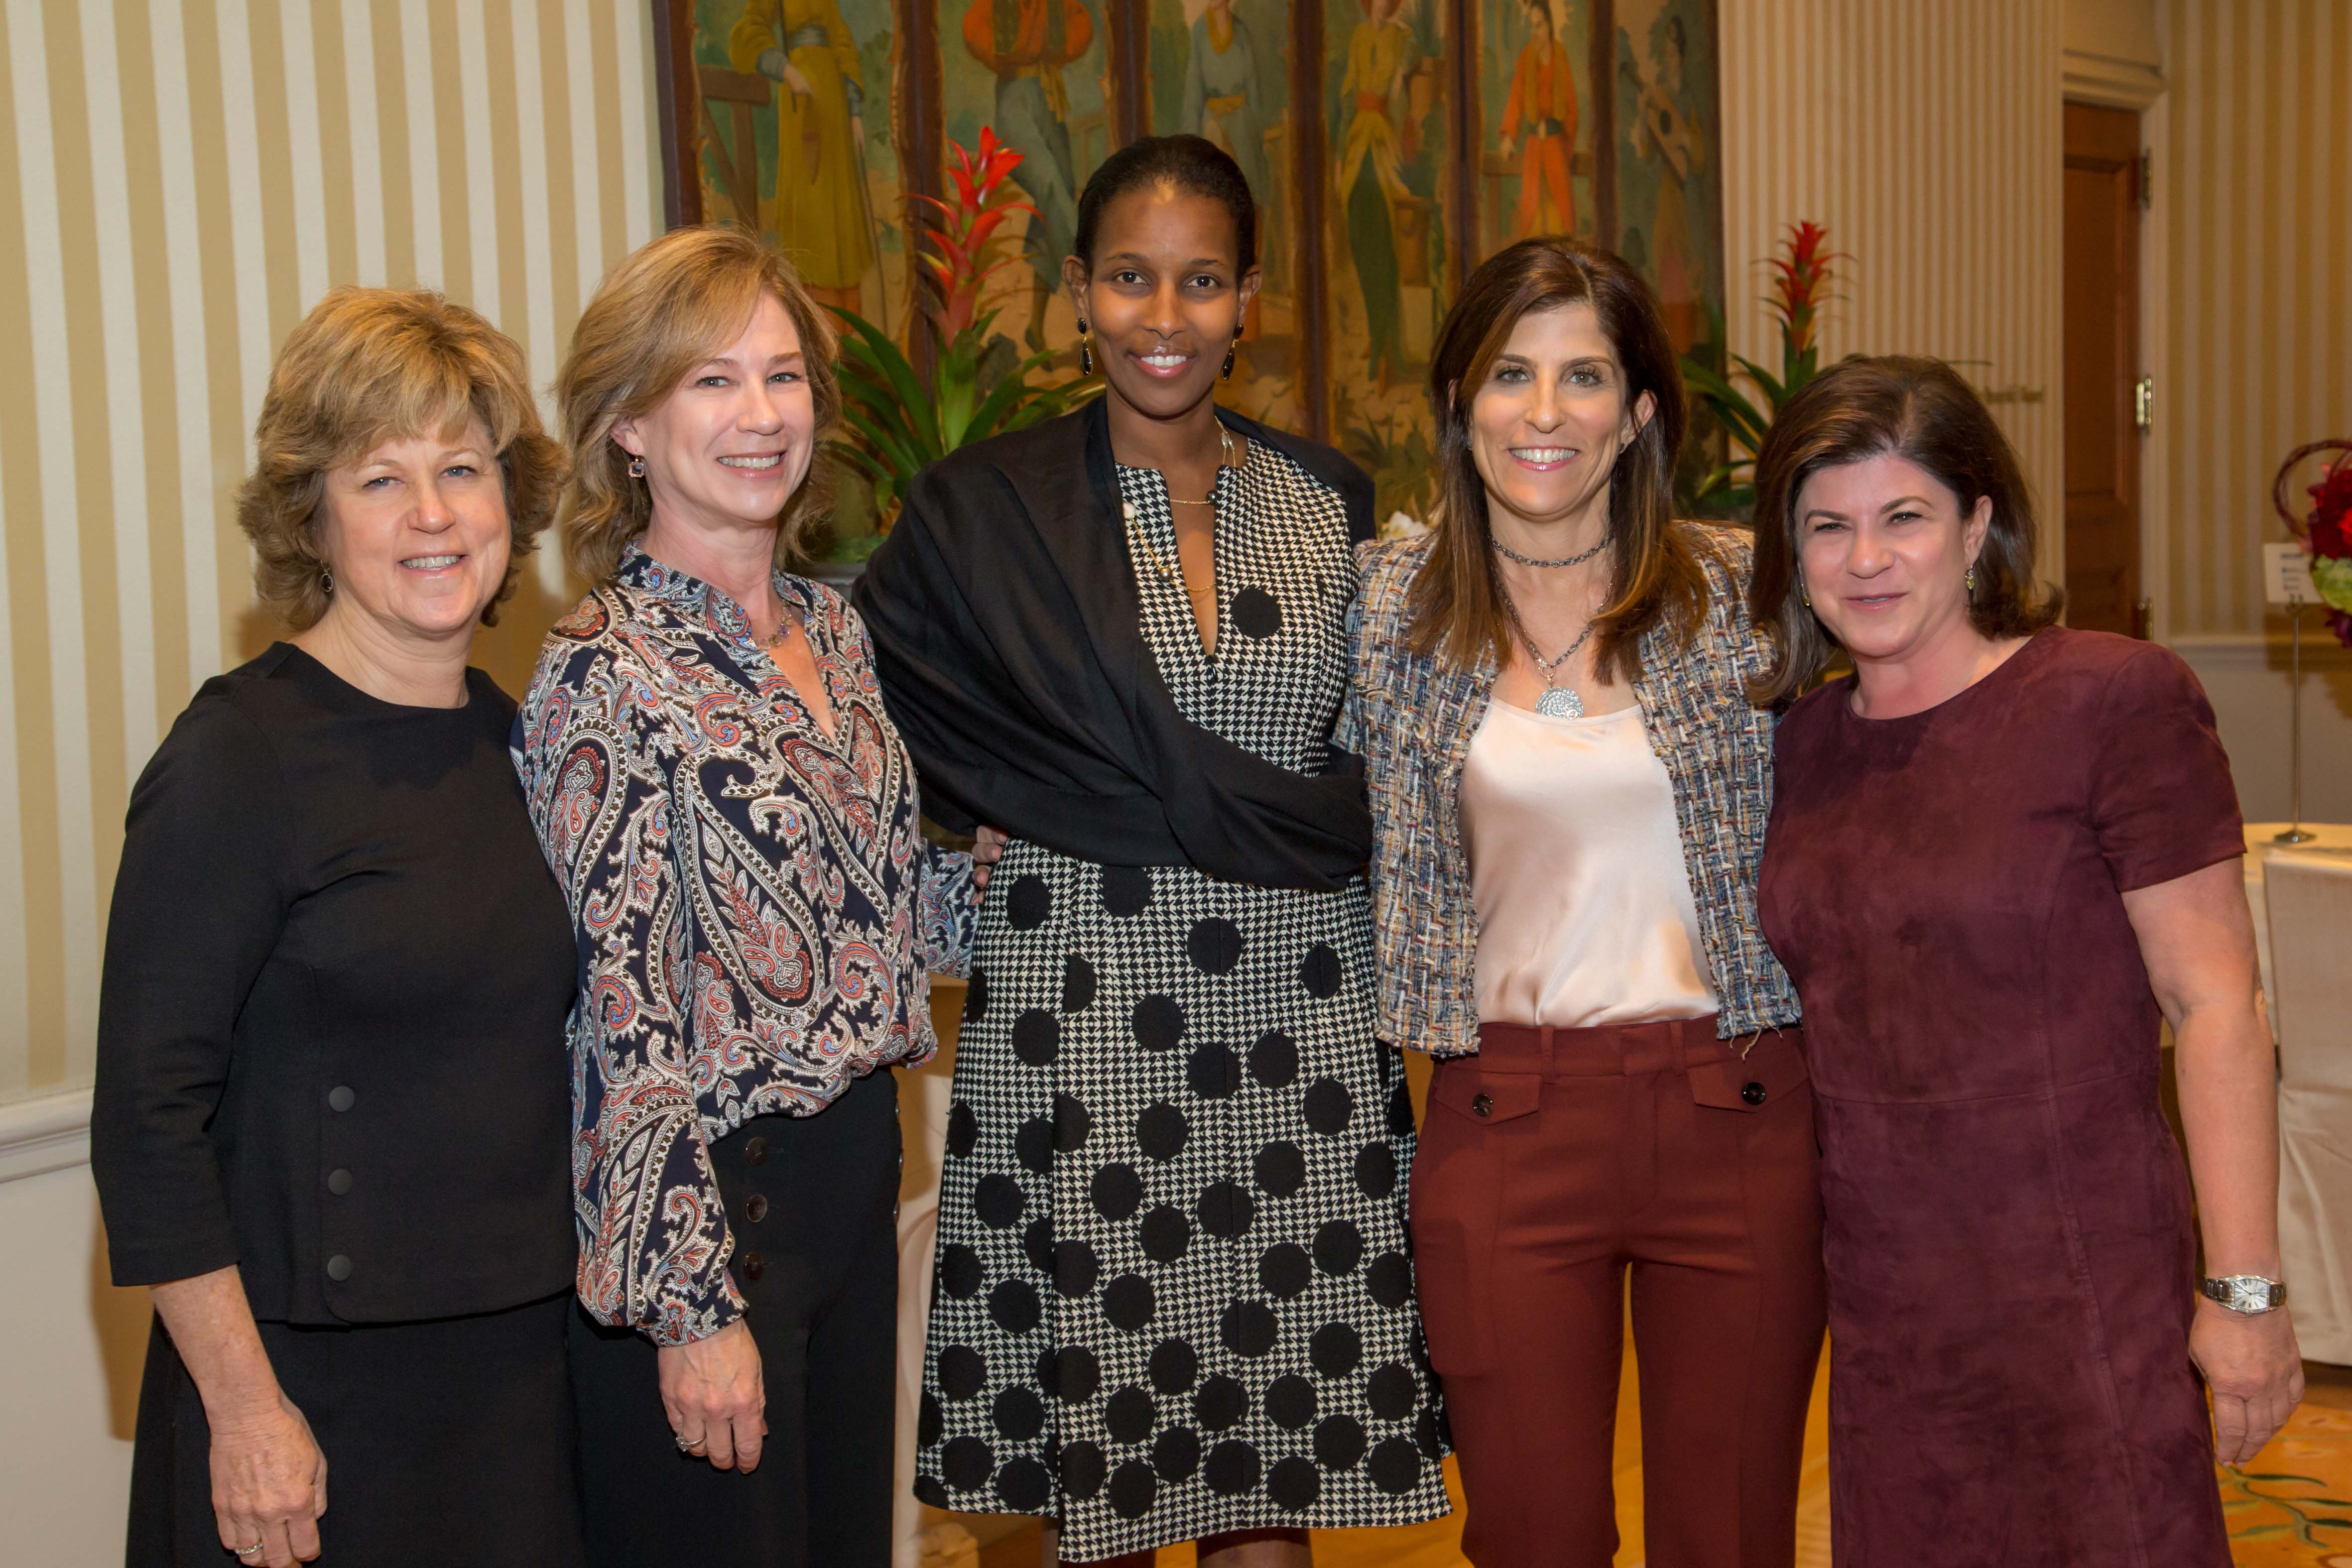 inher-circle-Beth-Friedman-Ayaan-Hirsi-Ali-salon02